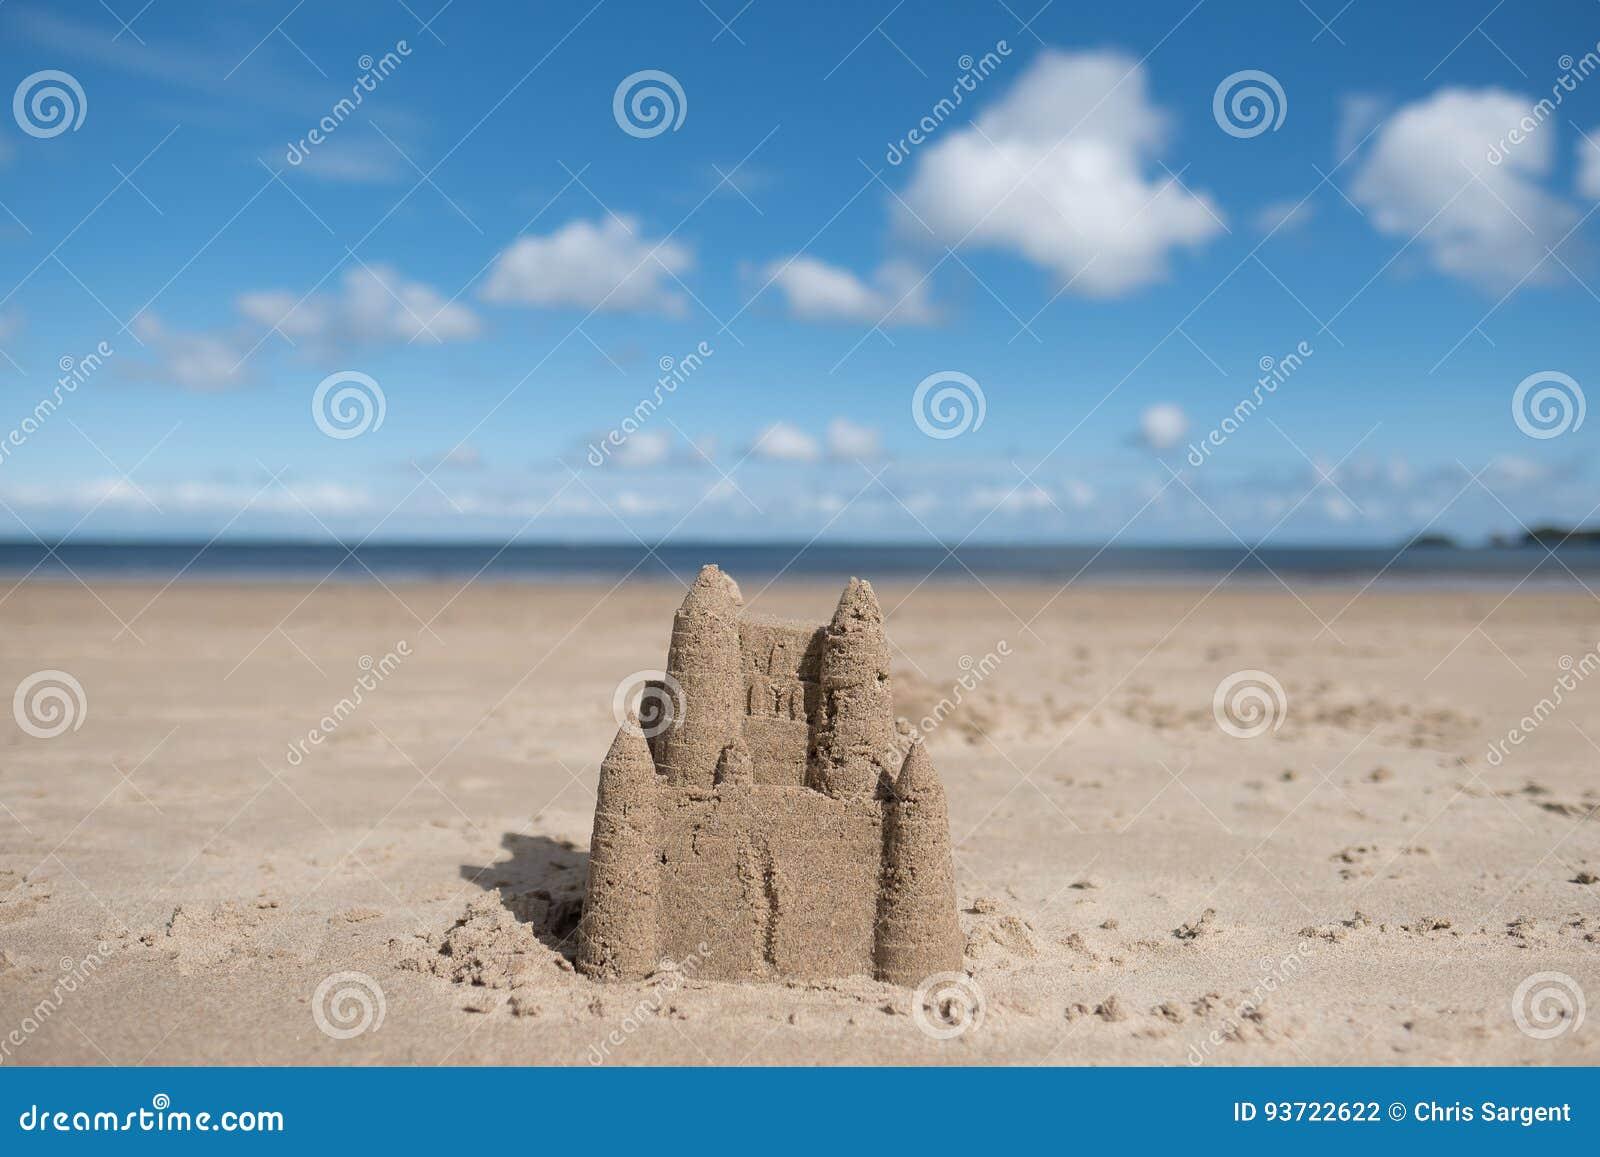 Piaska kasztel na plaży w Walia